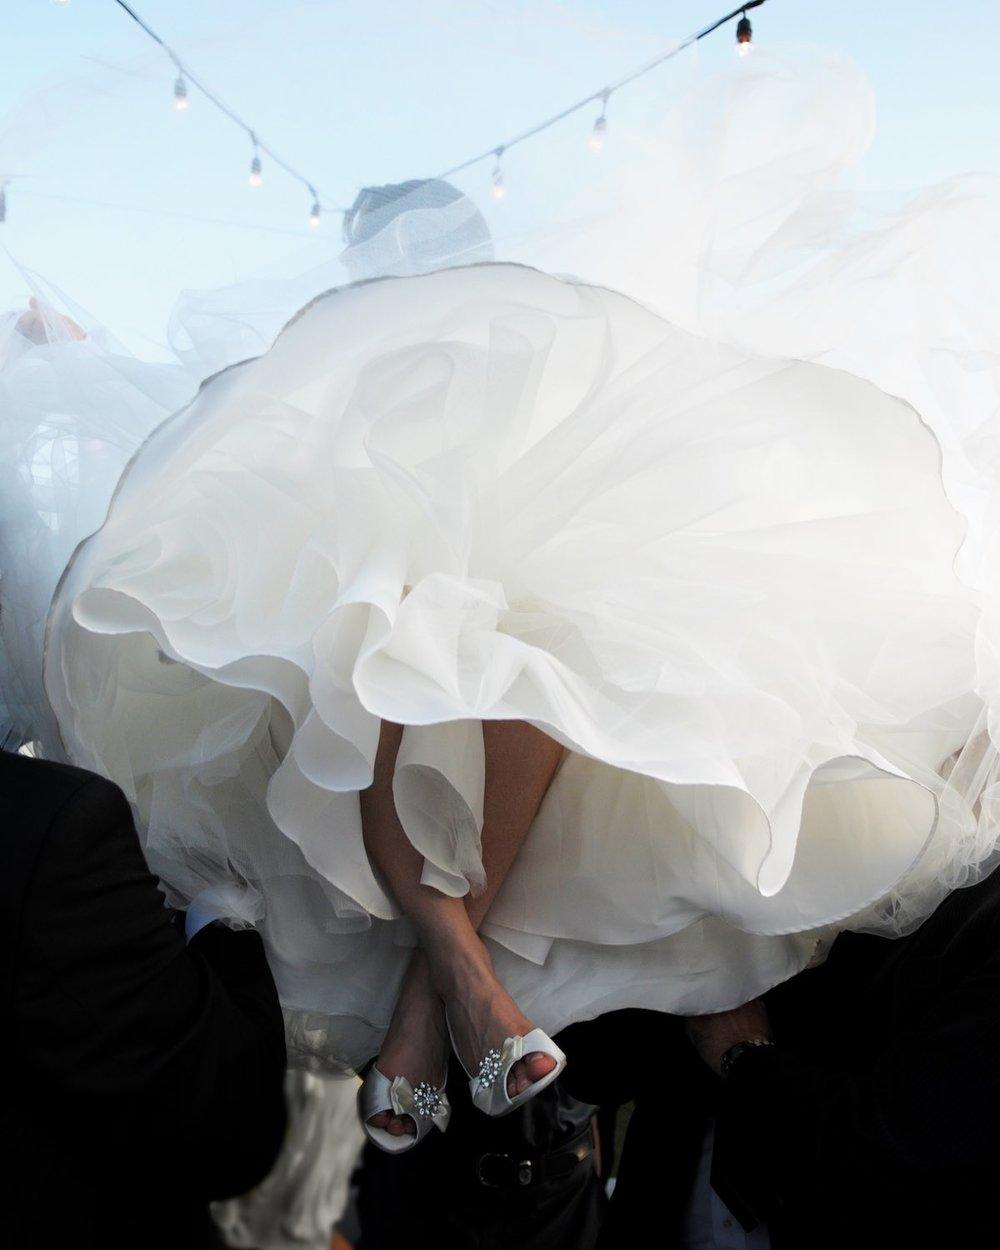 london-hotel-wedding-michal-pfeil-36.jpg